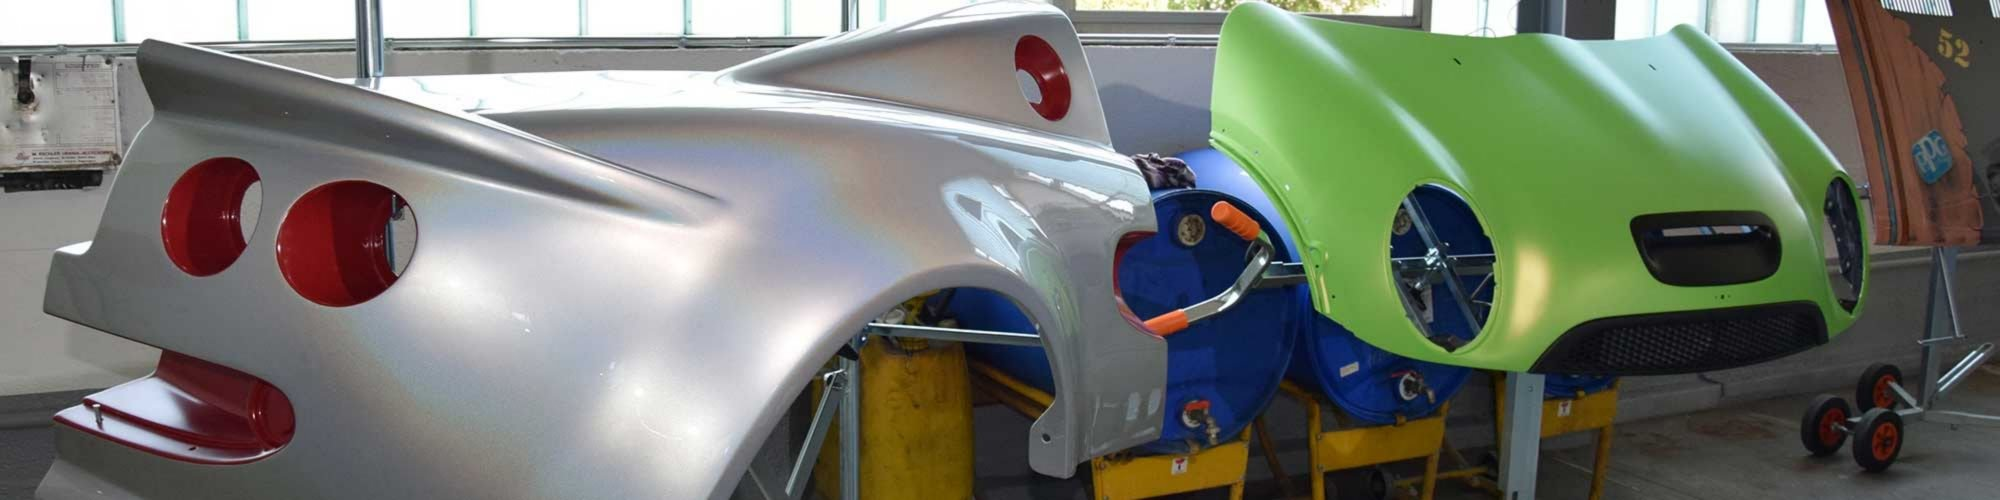 Auto Saameli Spritzwerk